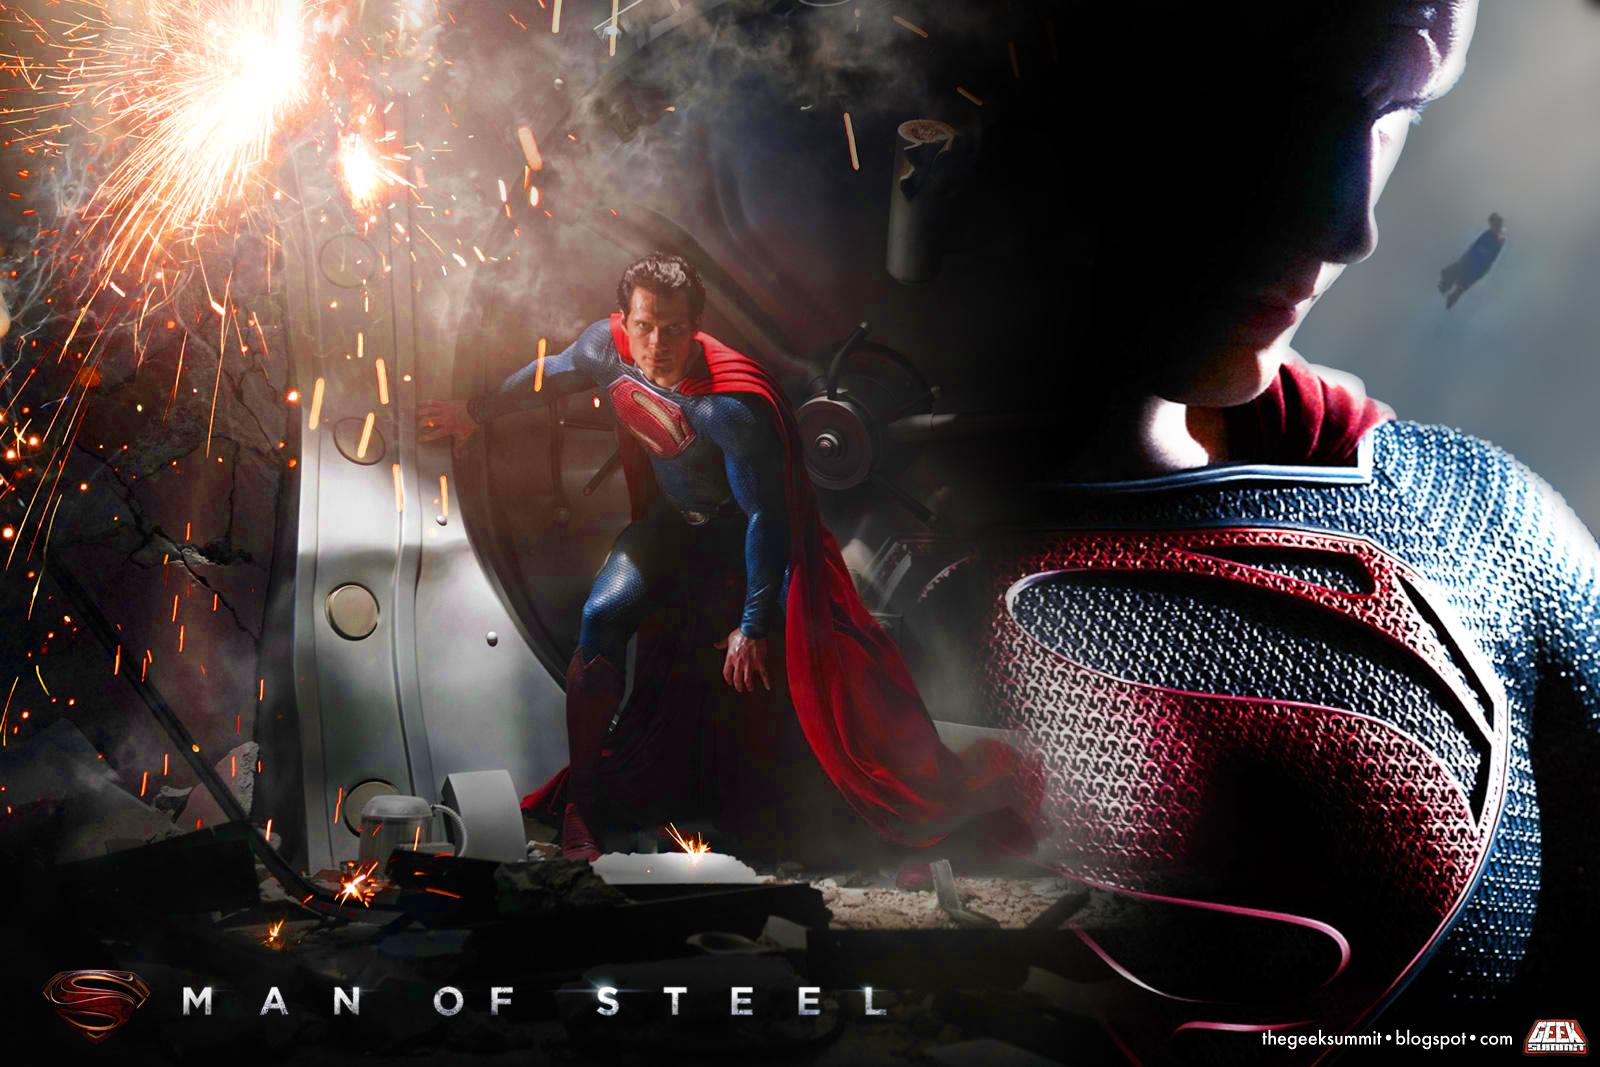 Future man of steel movies free